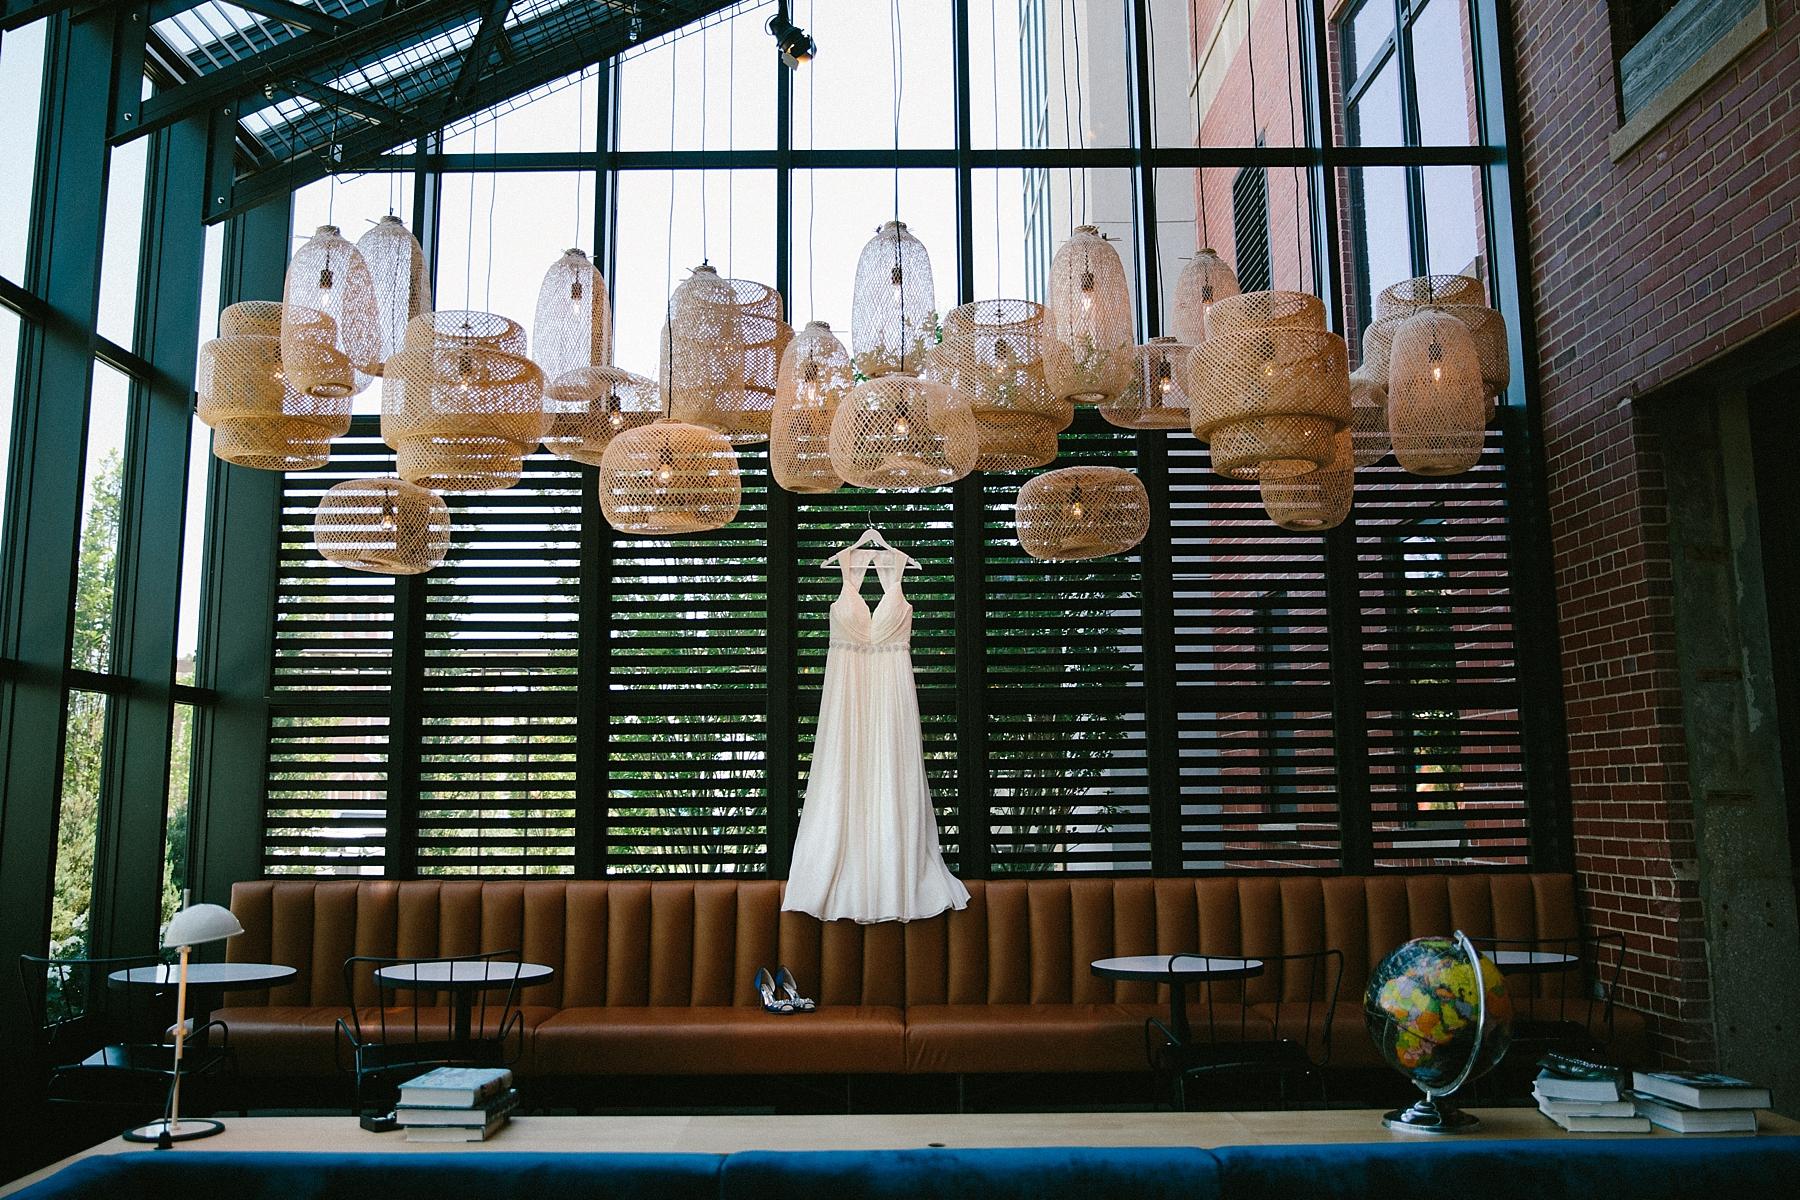 asbury-park-nj-wedding-salt-creek-grill_0001.jpg